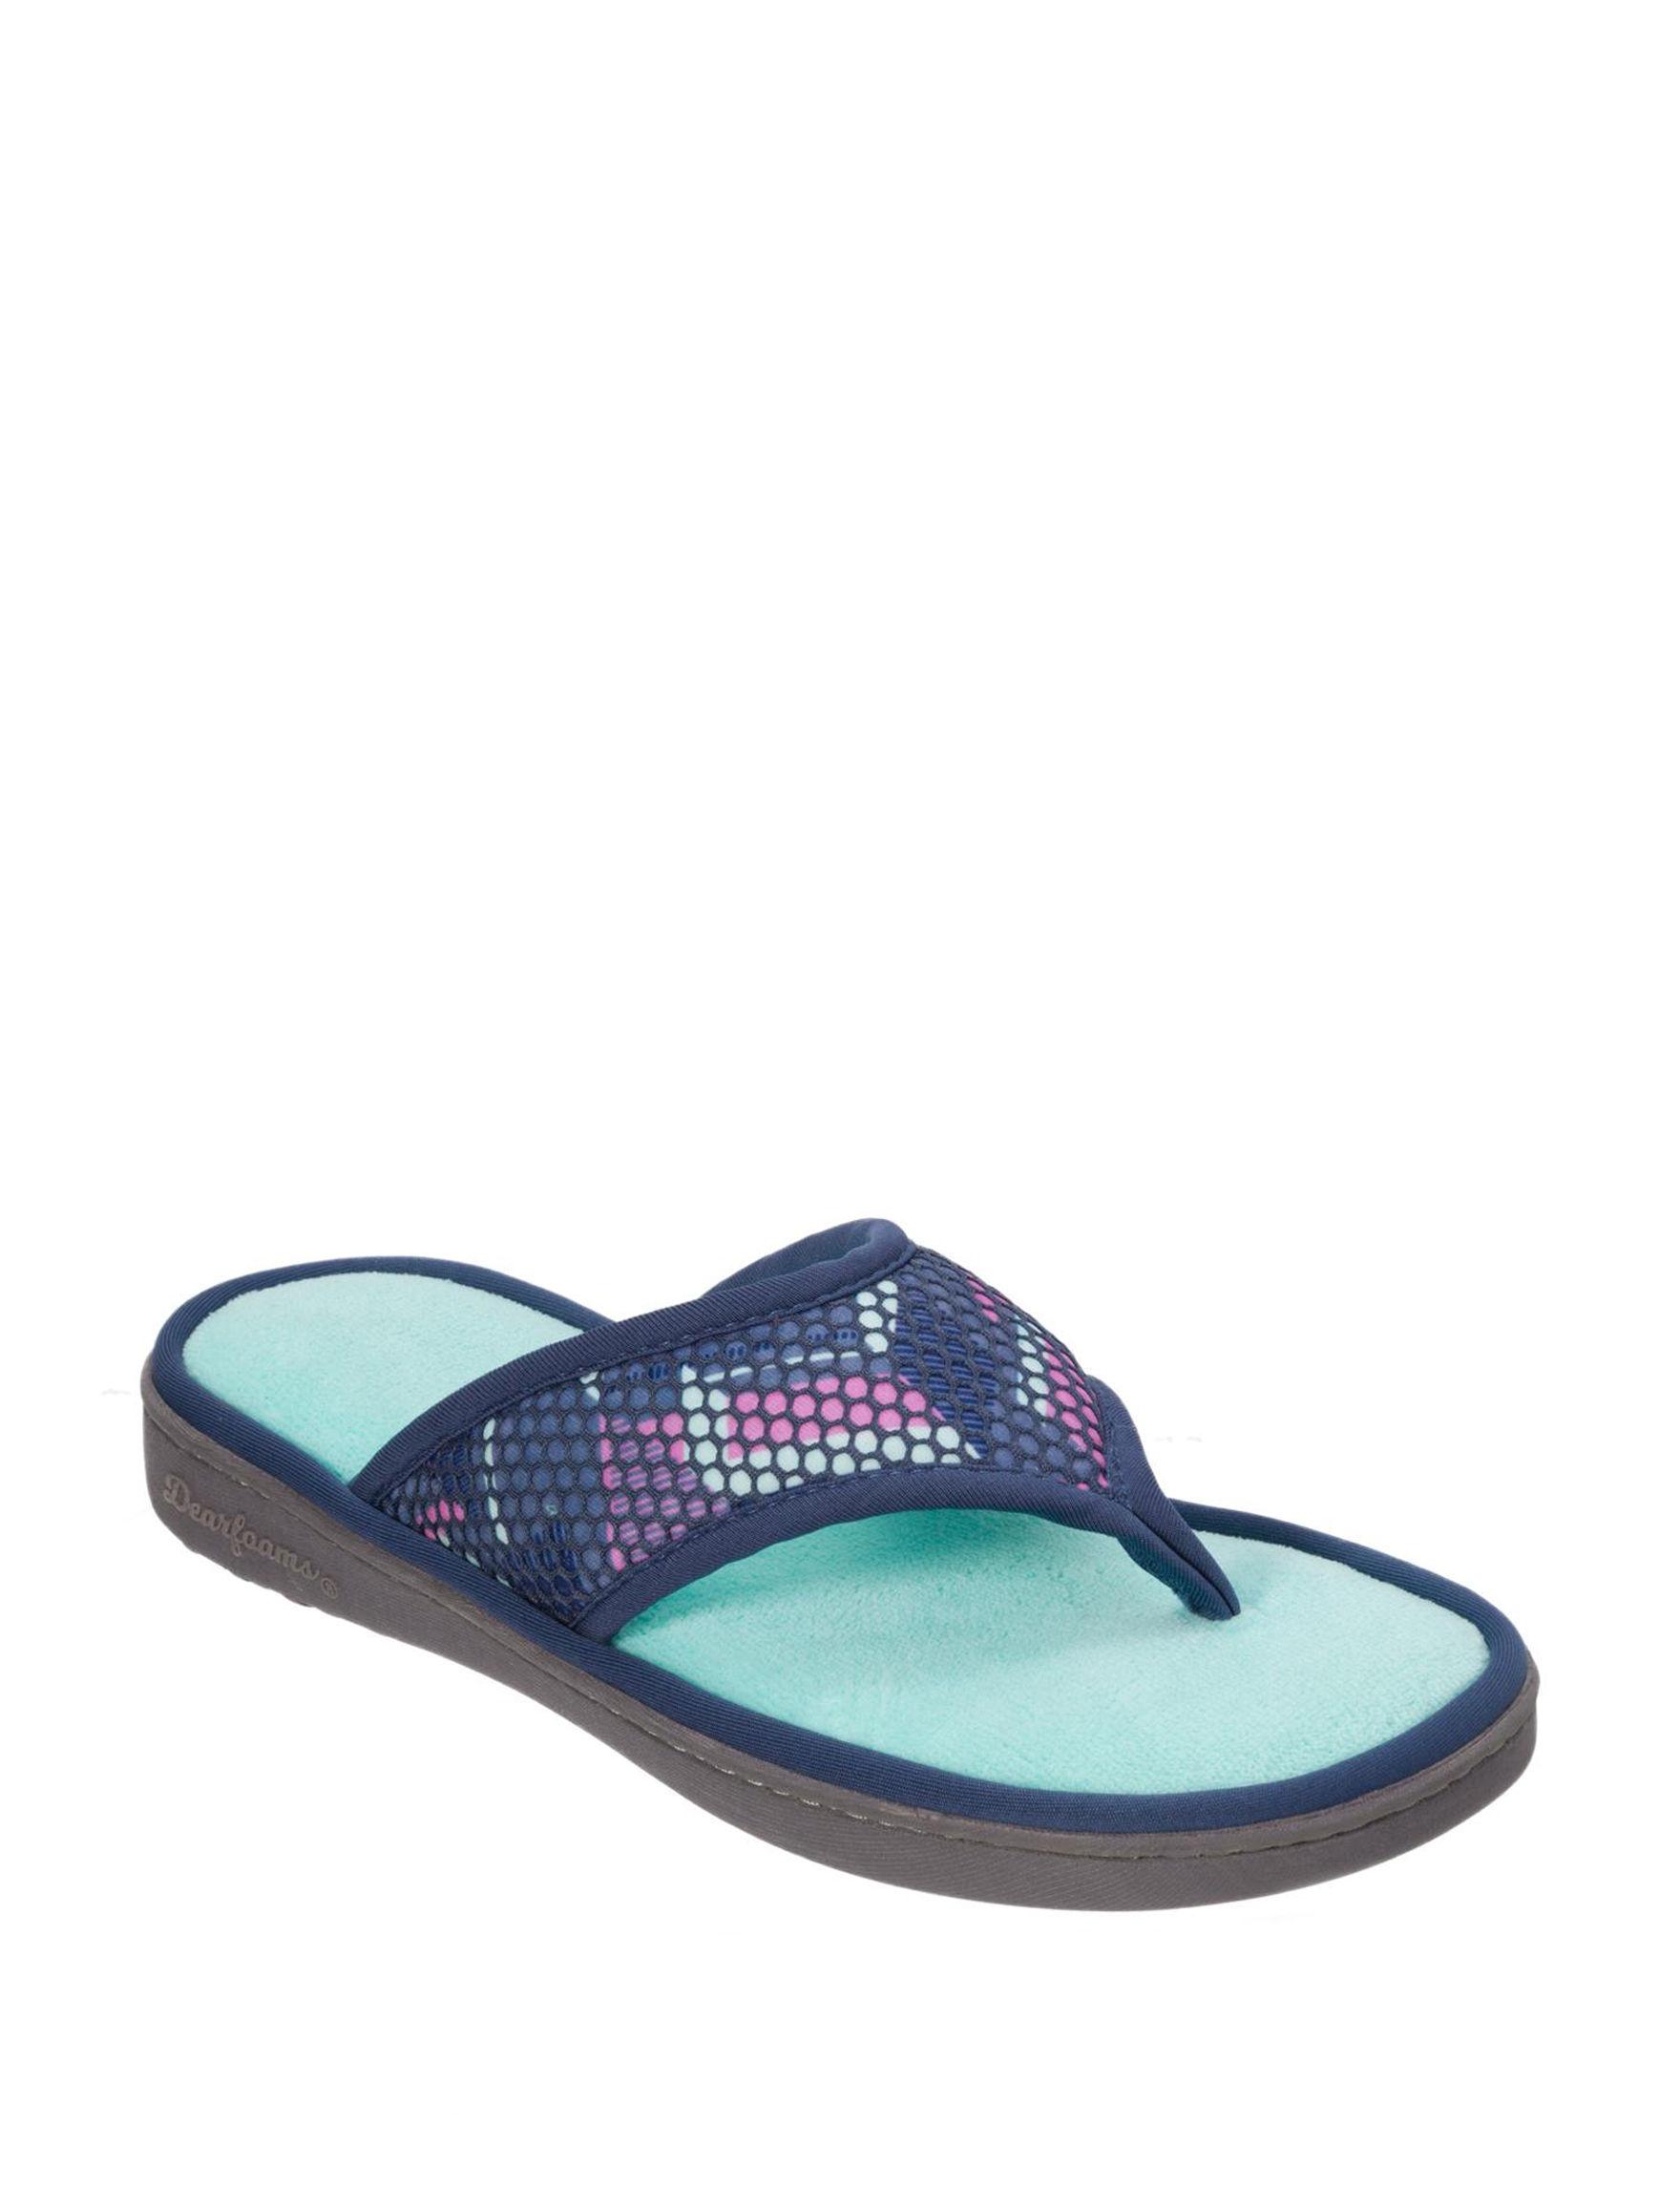 Dearfoam Teal Slipper Sandals